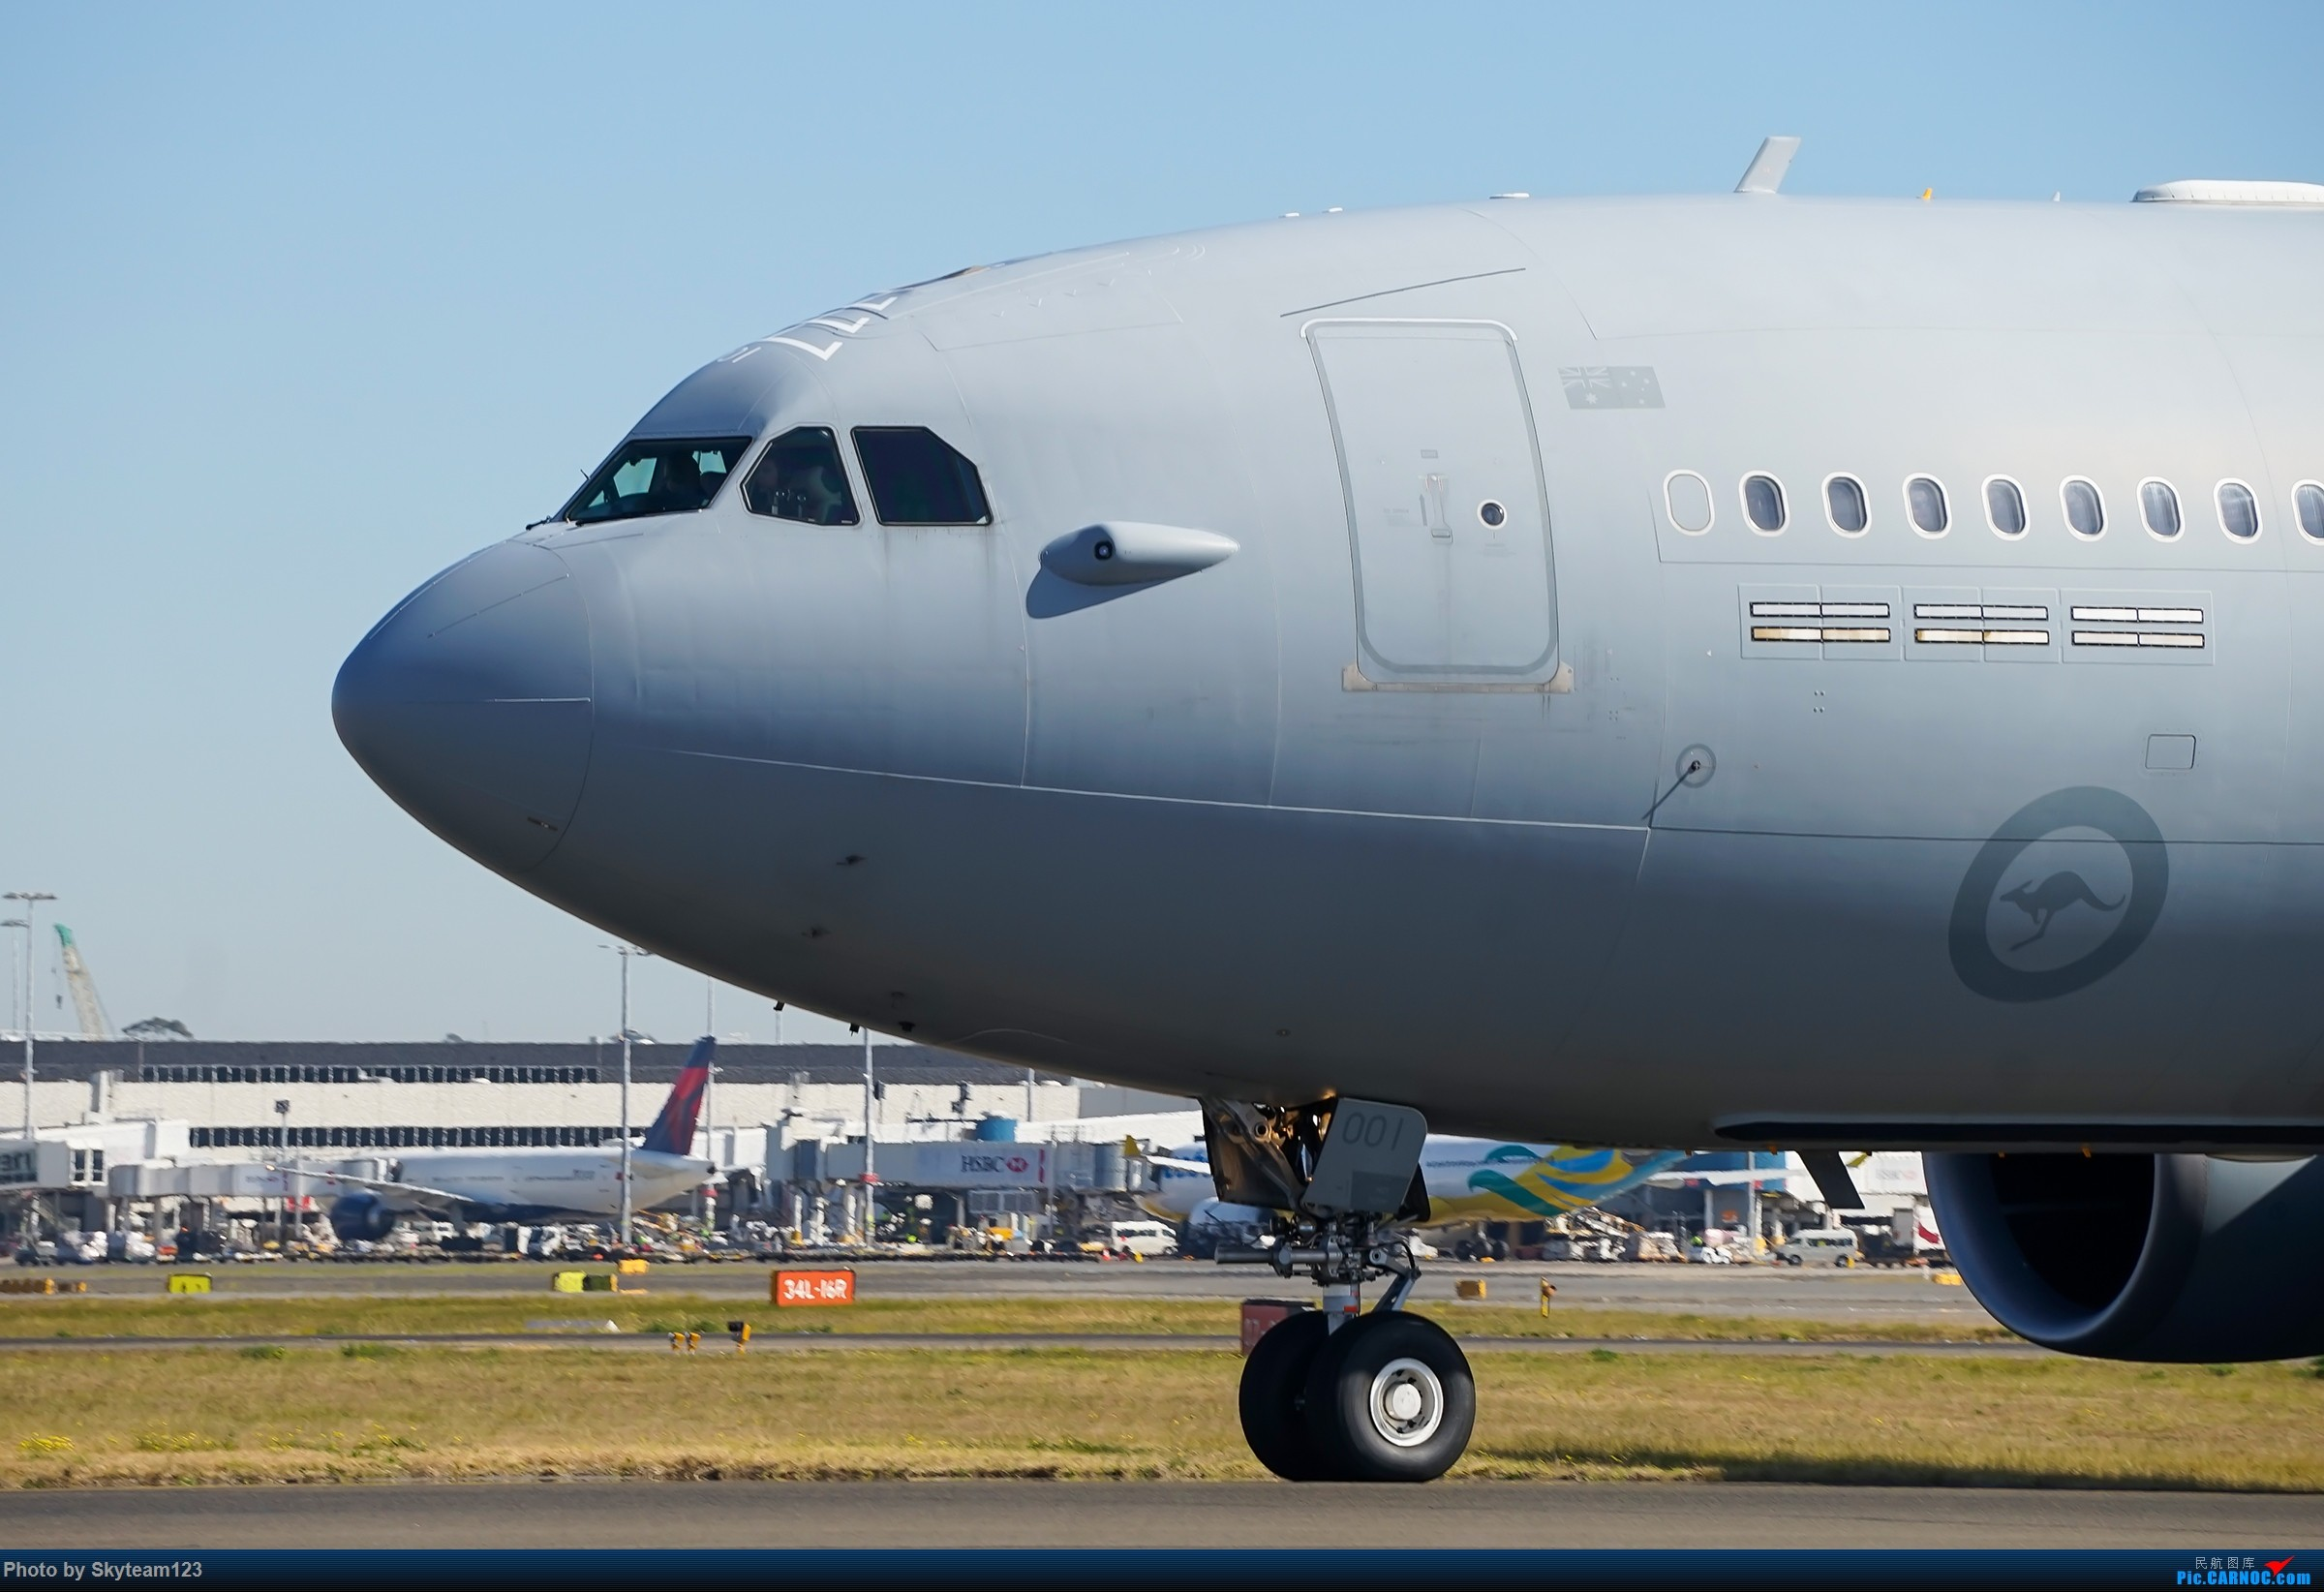 Re:[原创][SYD] 再访Blu EMU停车场 早上34L抵港出发杂图几张 AIRBUS A330 MRTT 未知 澳大利亚悉尼金斯福德·史密斯机场